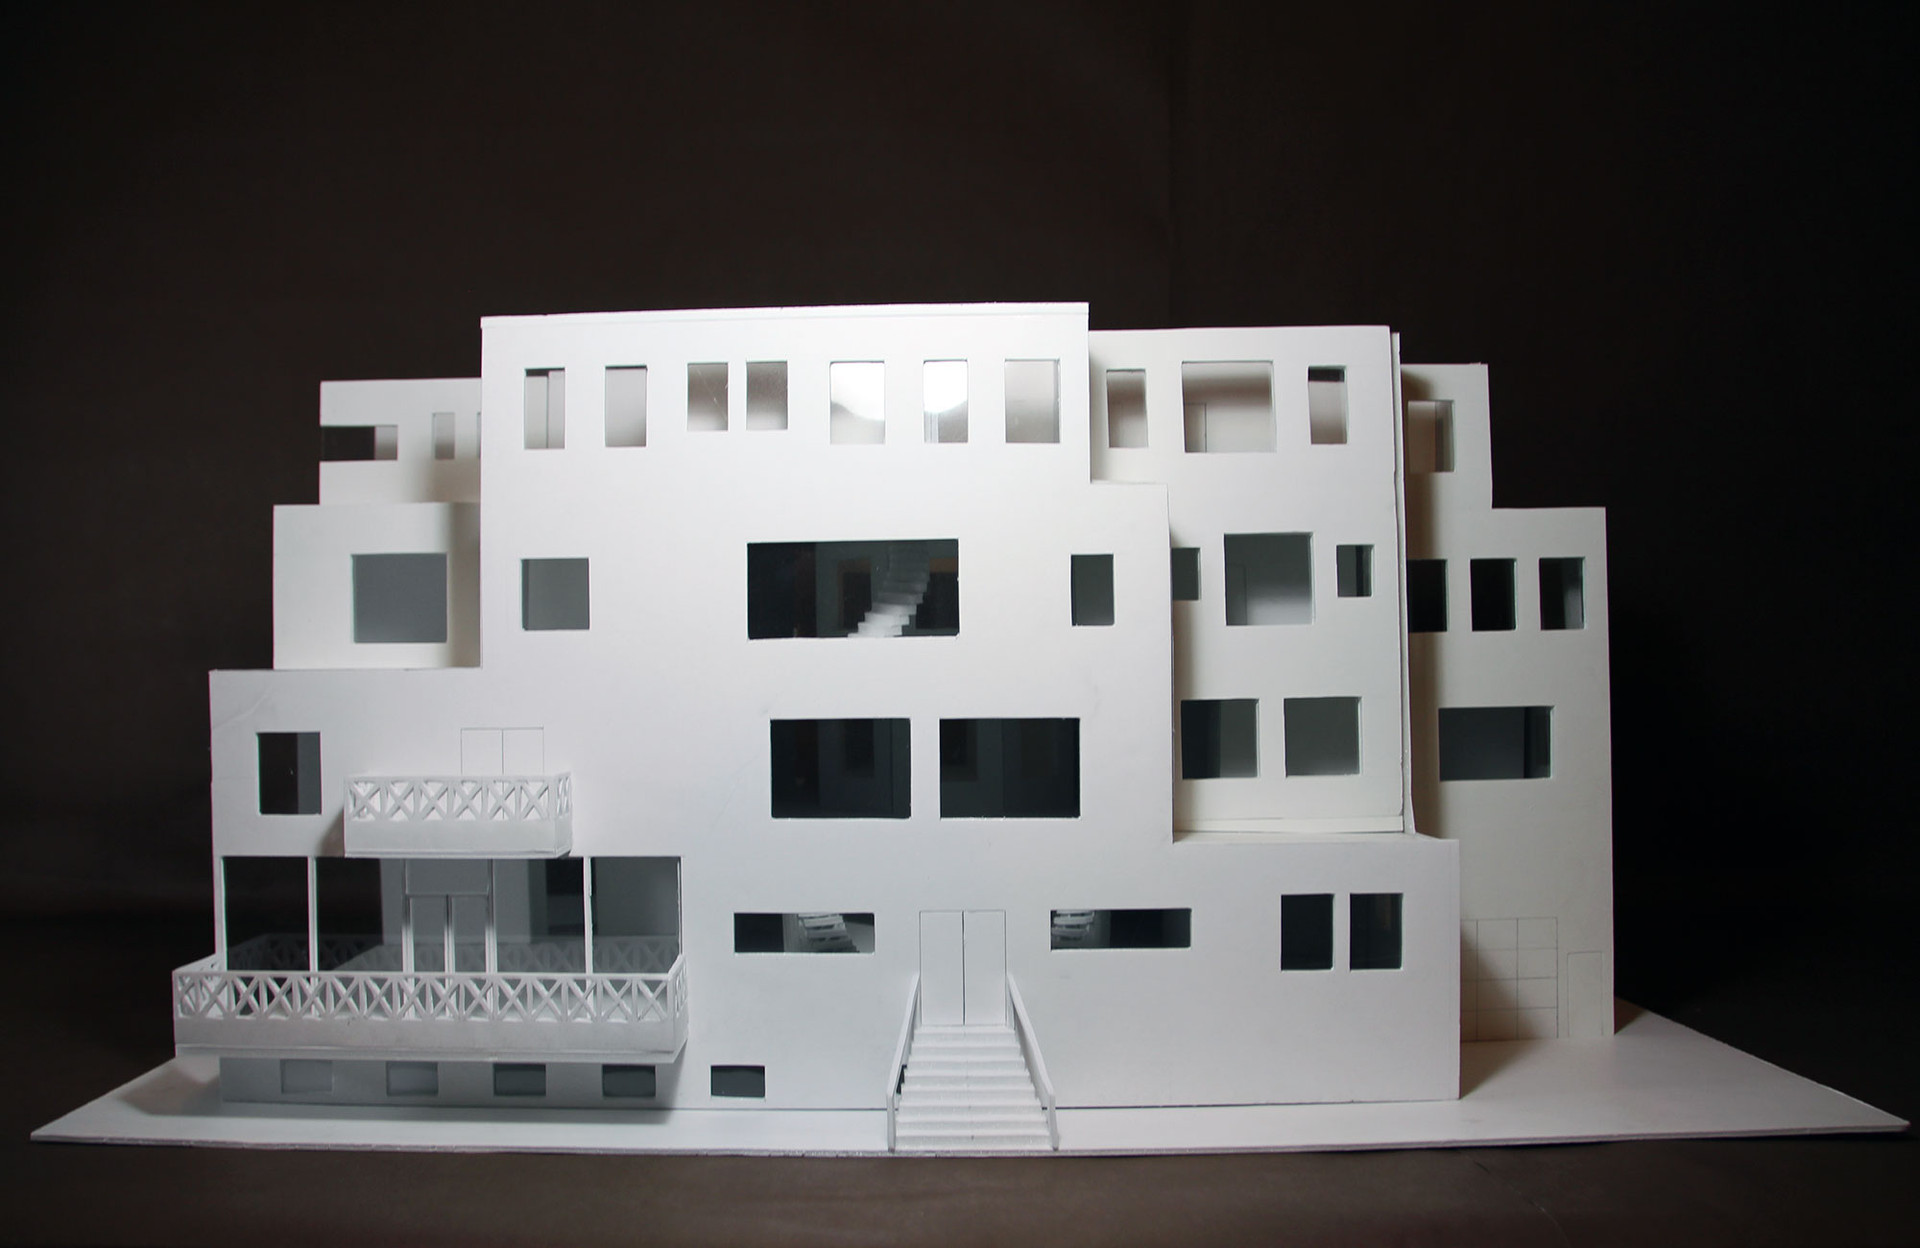 "Domestic Model Materials: Foam core Scale: 1/4"" x 1' Dimensions: 28.25 x 20 x 14.5"""